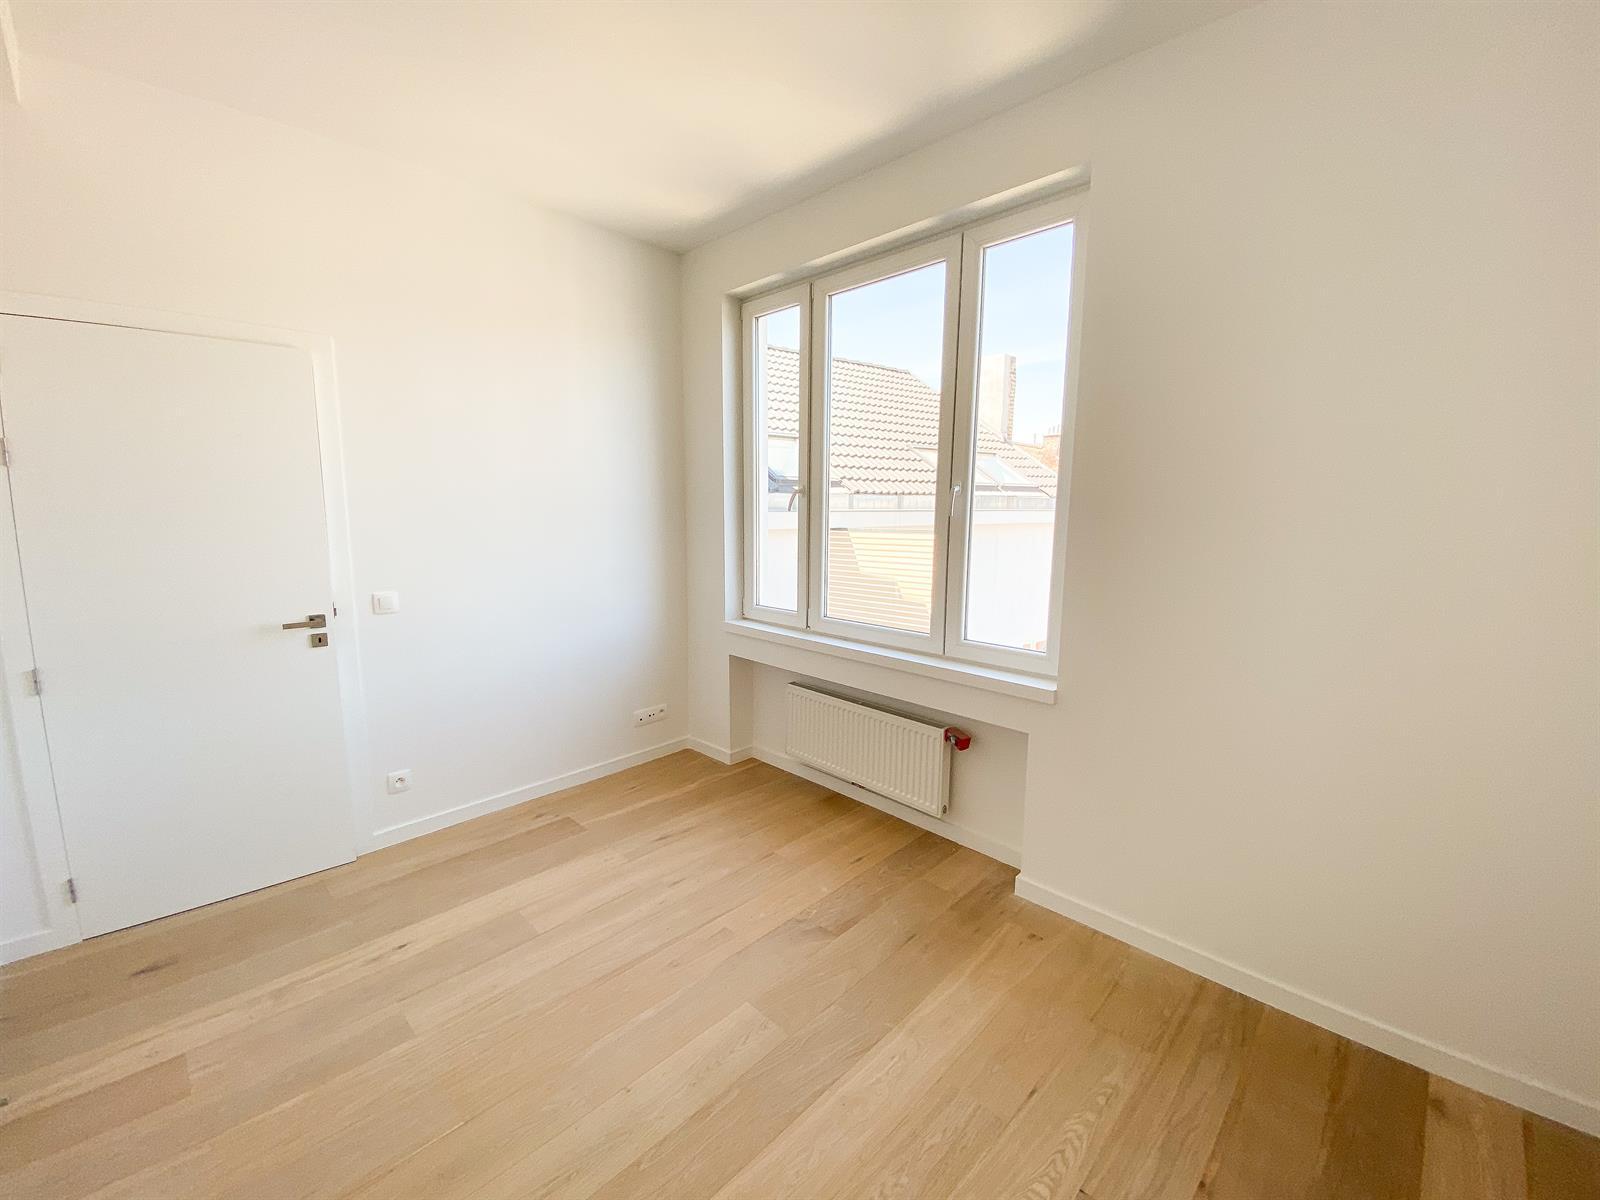 Appartement - Liège - #4045817-11